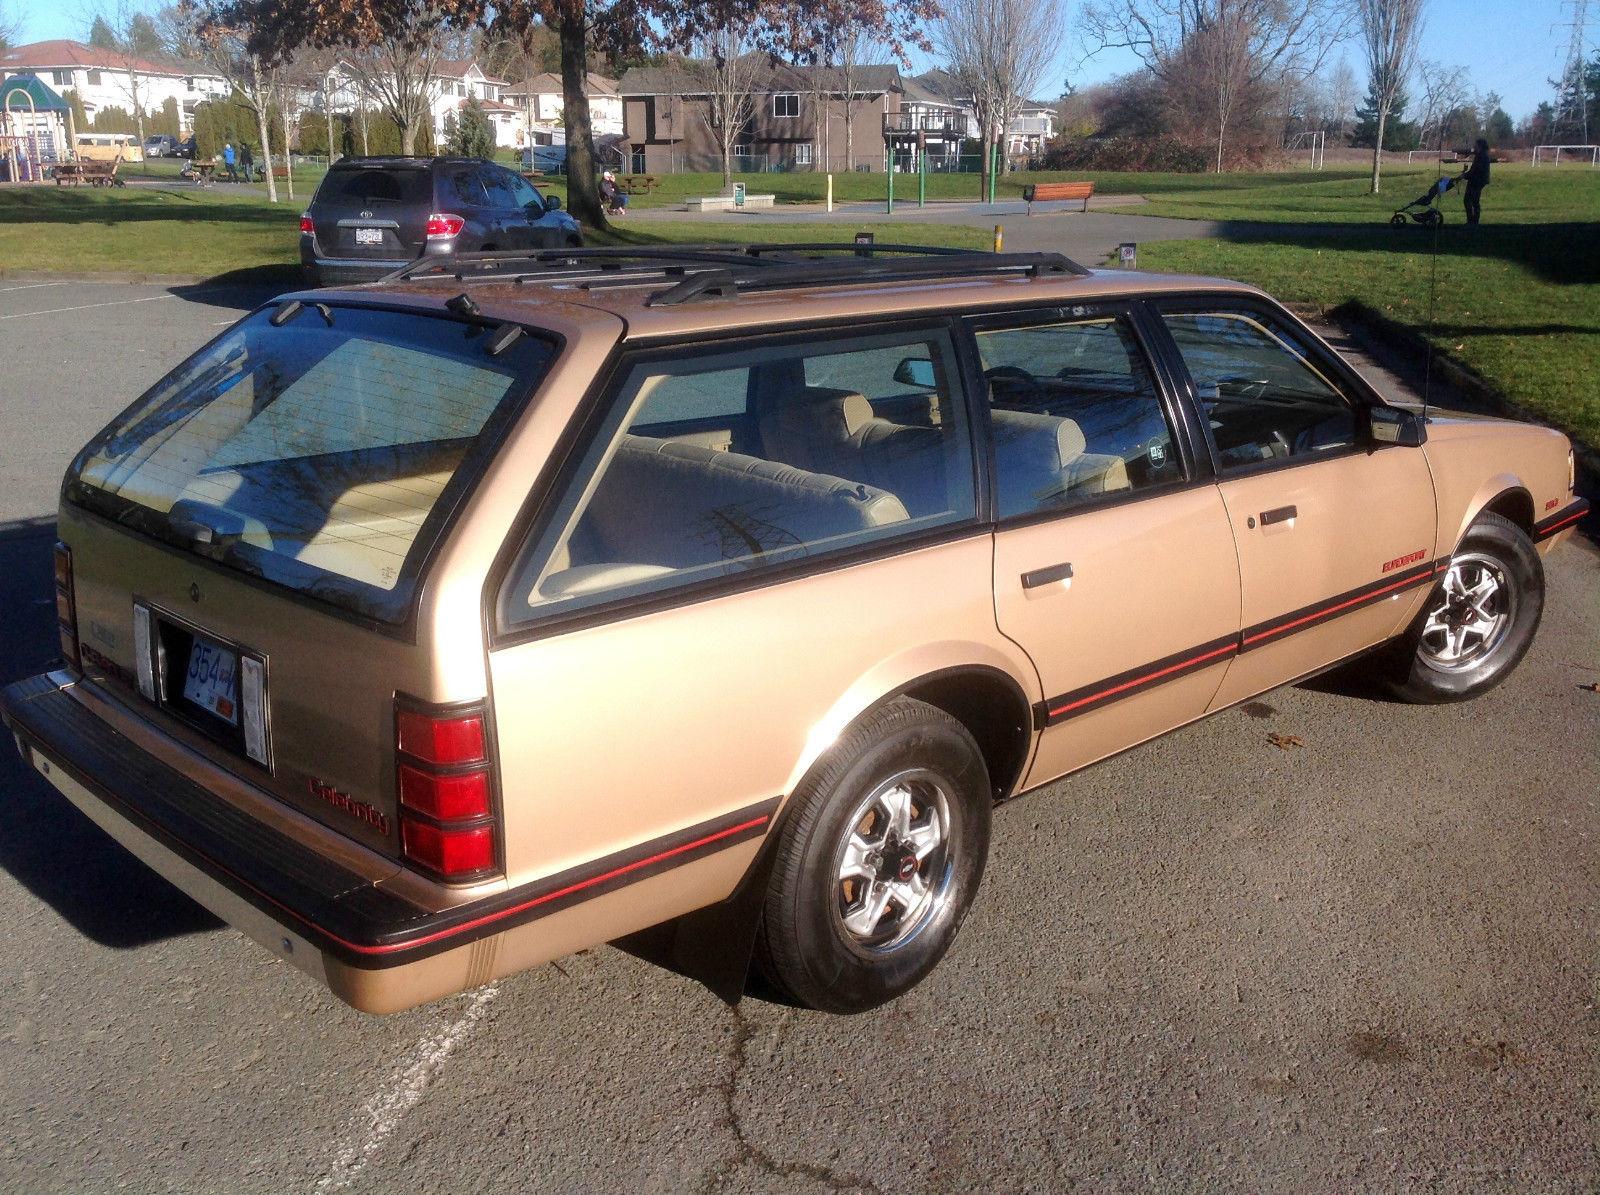 Chevrolet chevrolet station wagon : Celebrity Eurosport Wagon, Eh!